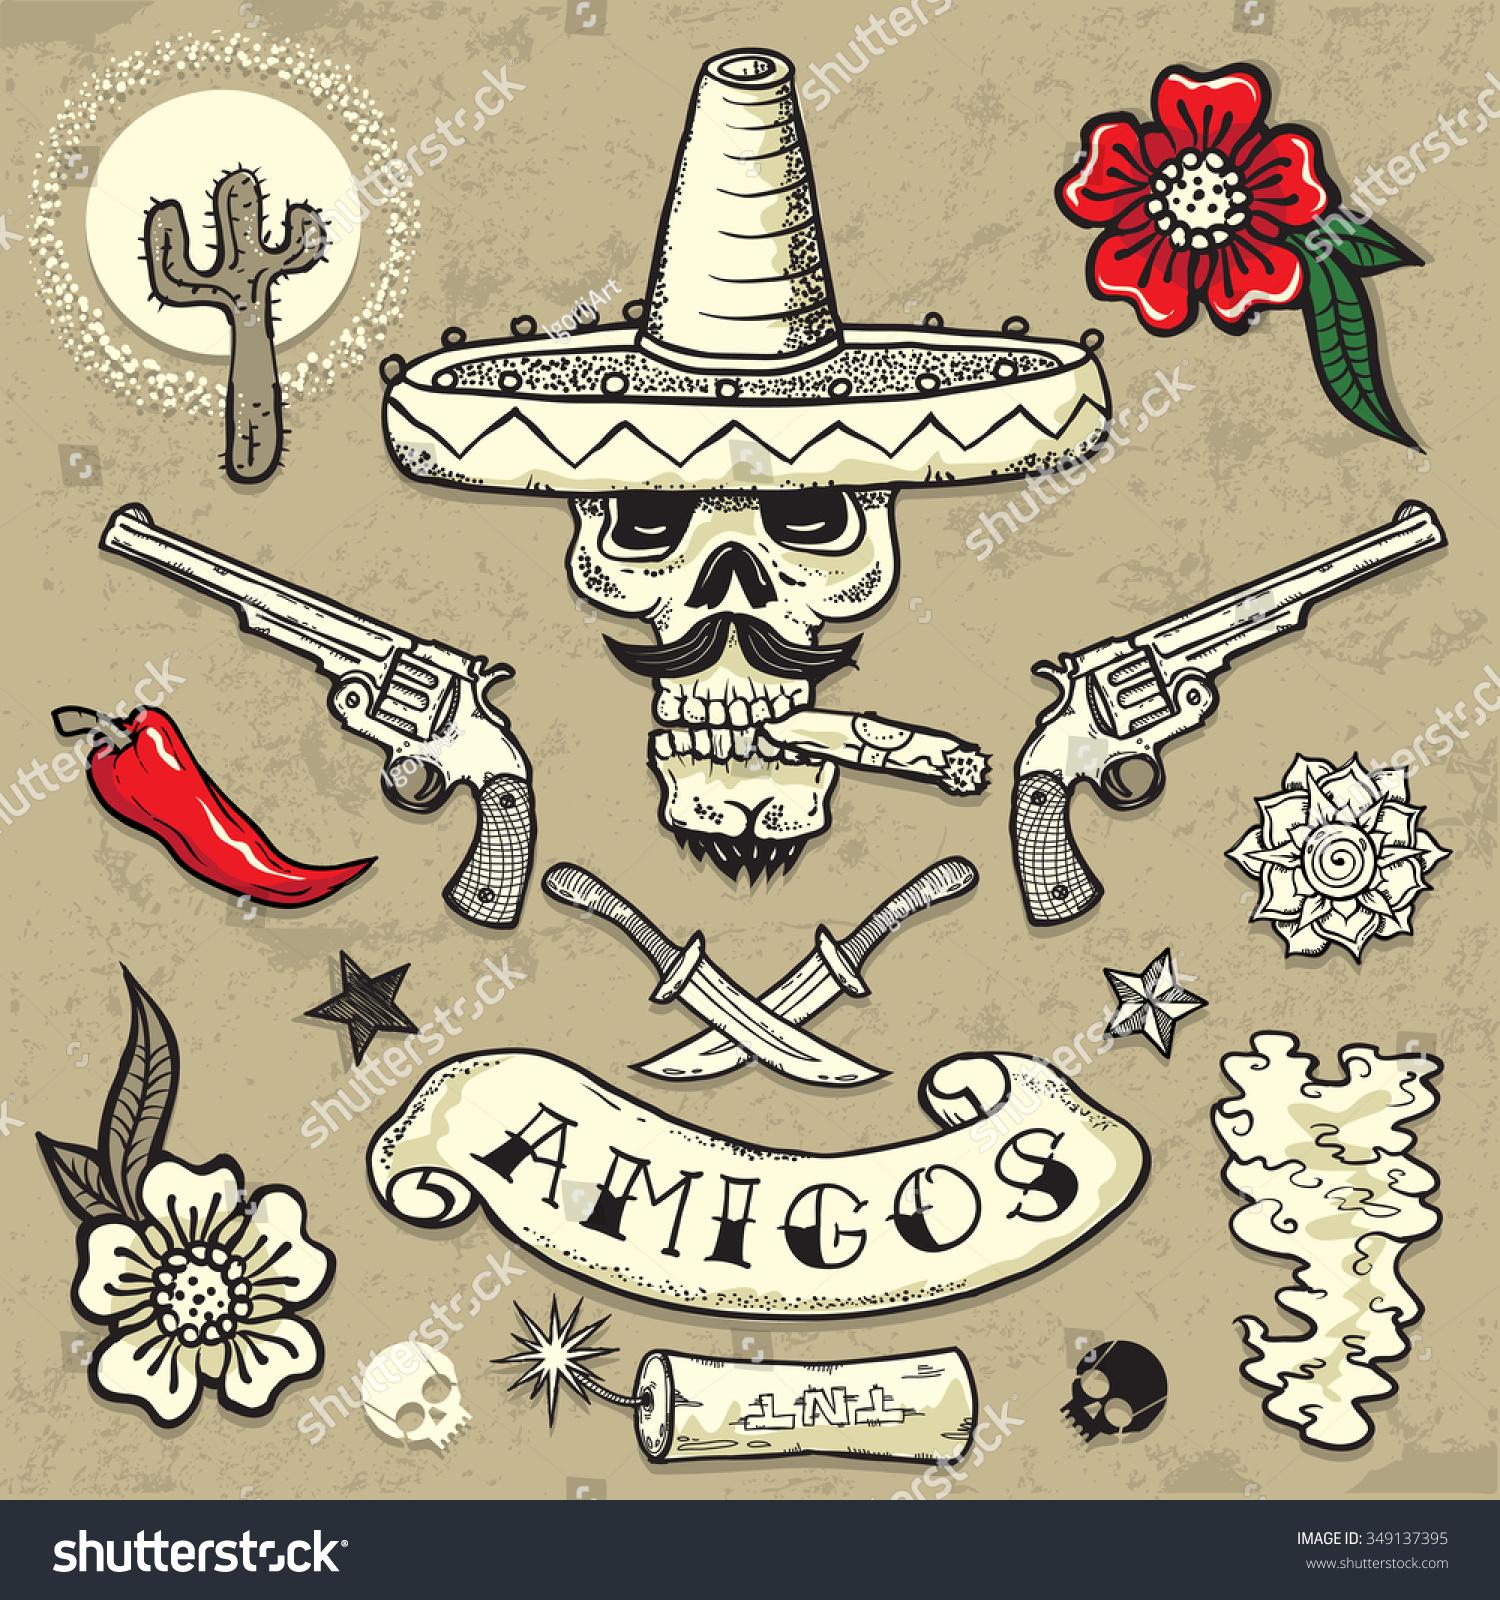 set vector elements mexican theme tattooart stock vector 349137395 shutterstock. Black Bedroom Furniture Sets. Home Design Ideas